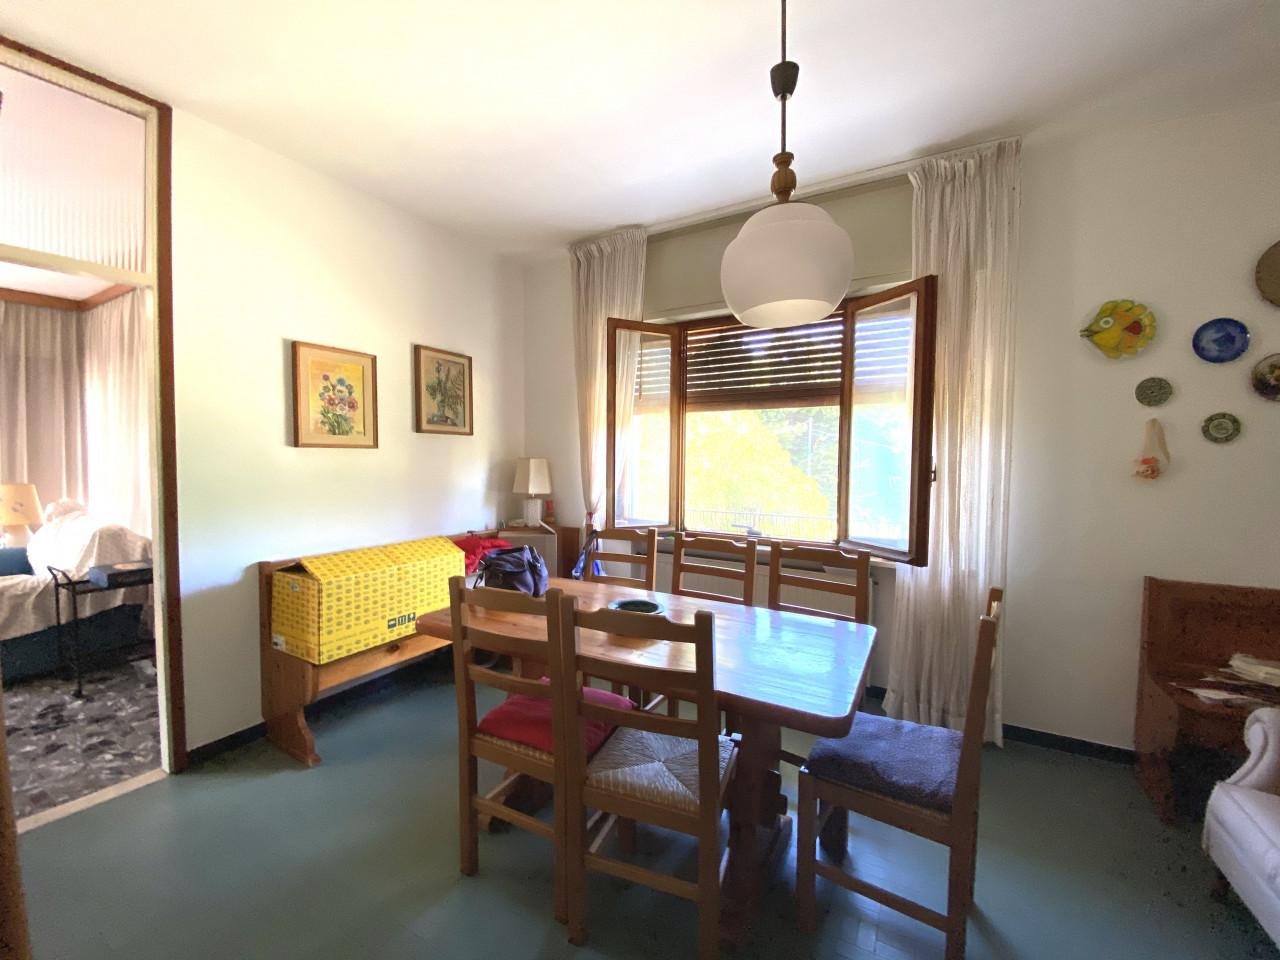 Casa singola con capannone in vendita in centro a Budoia - Rif. V.D.1 https://images.gestionaleimmobiliare.it/foto/annunci/200702/2265893/1280x1280/003__img_2978.jpg